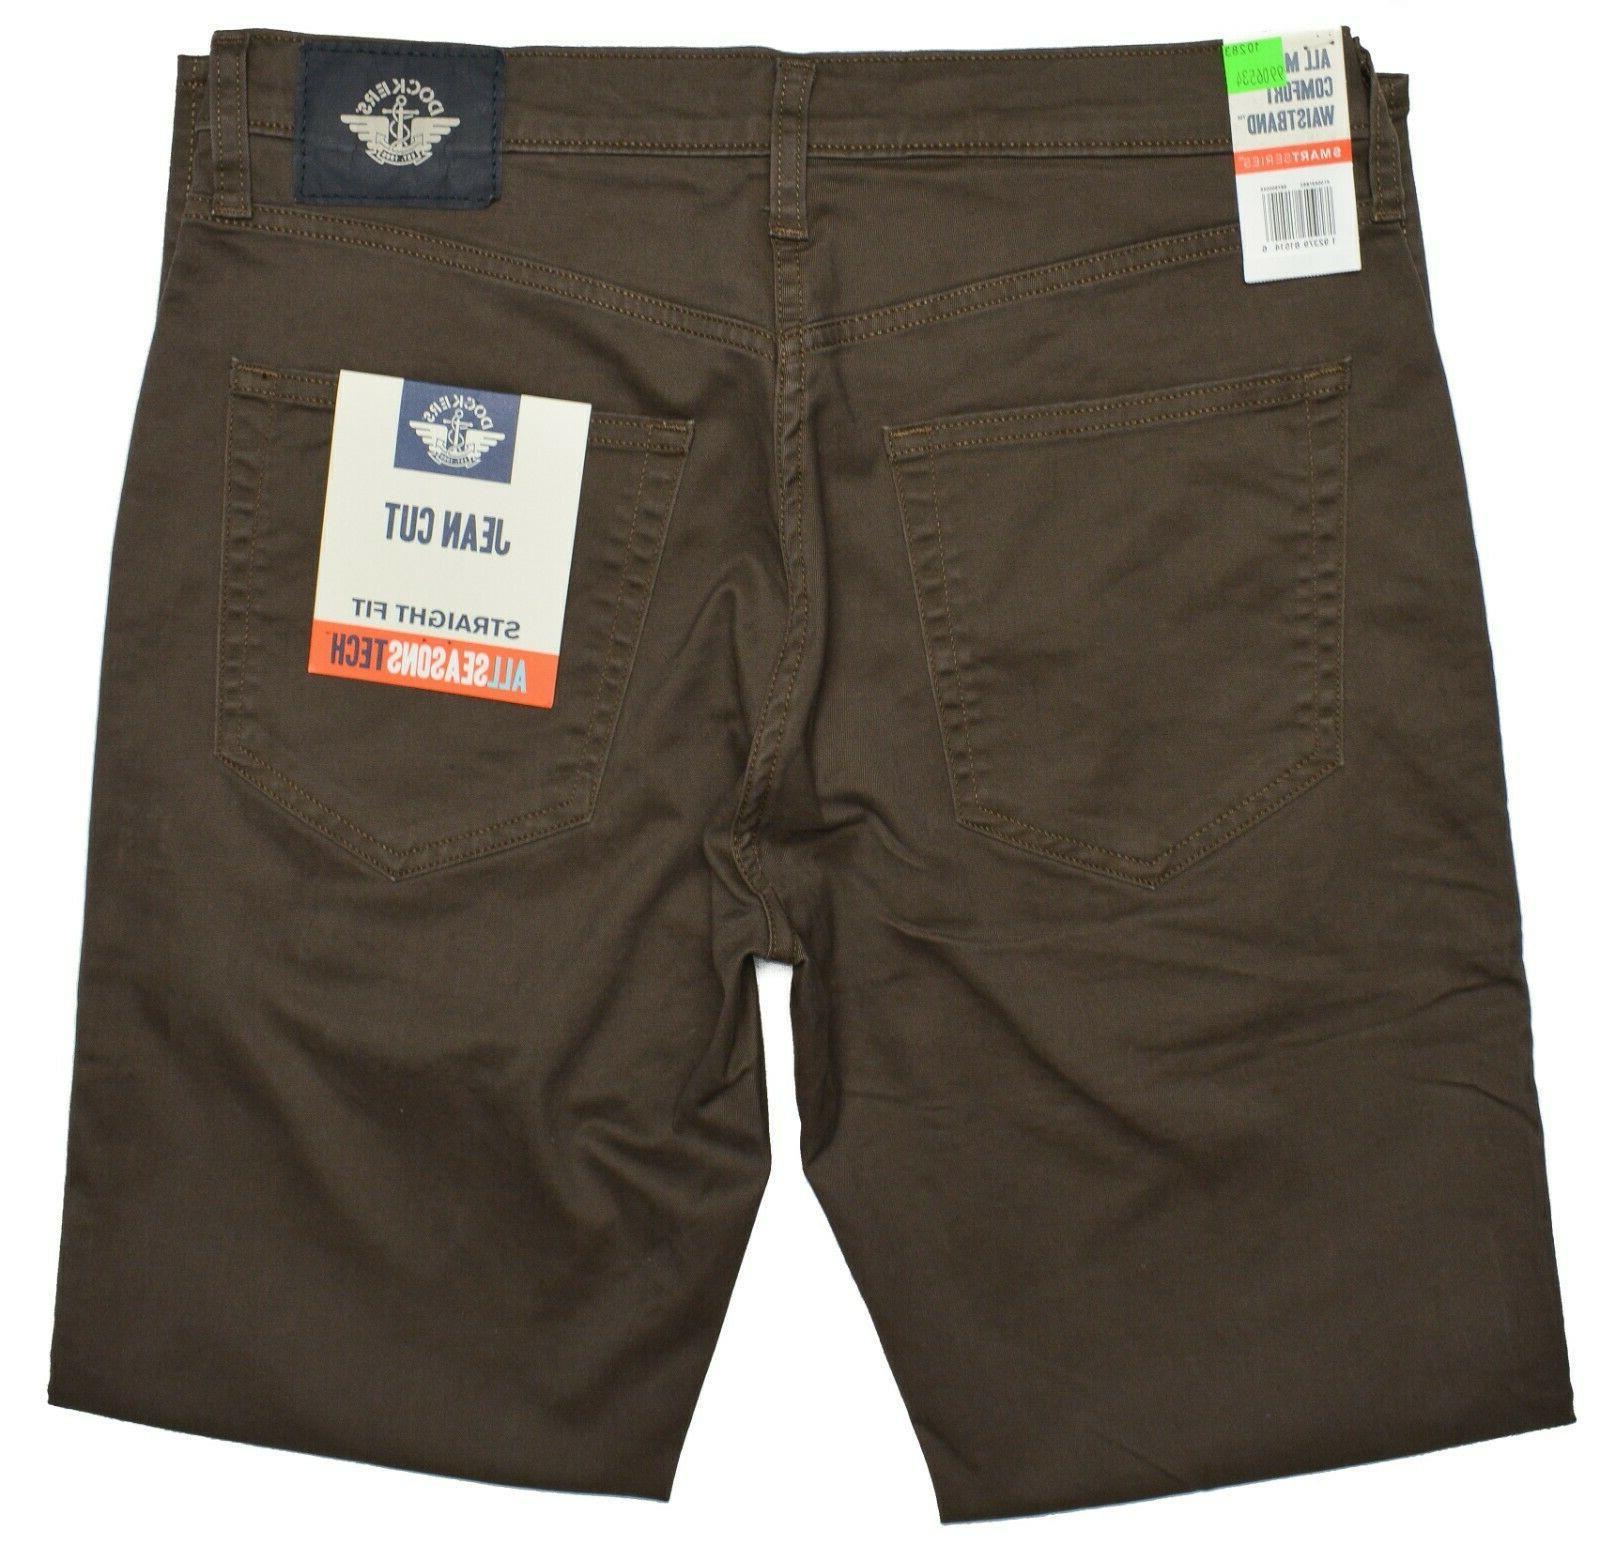 Dockers NEW Men's Straight Jean All Seasons Tech Stretch Pants